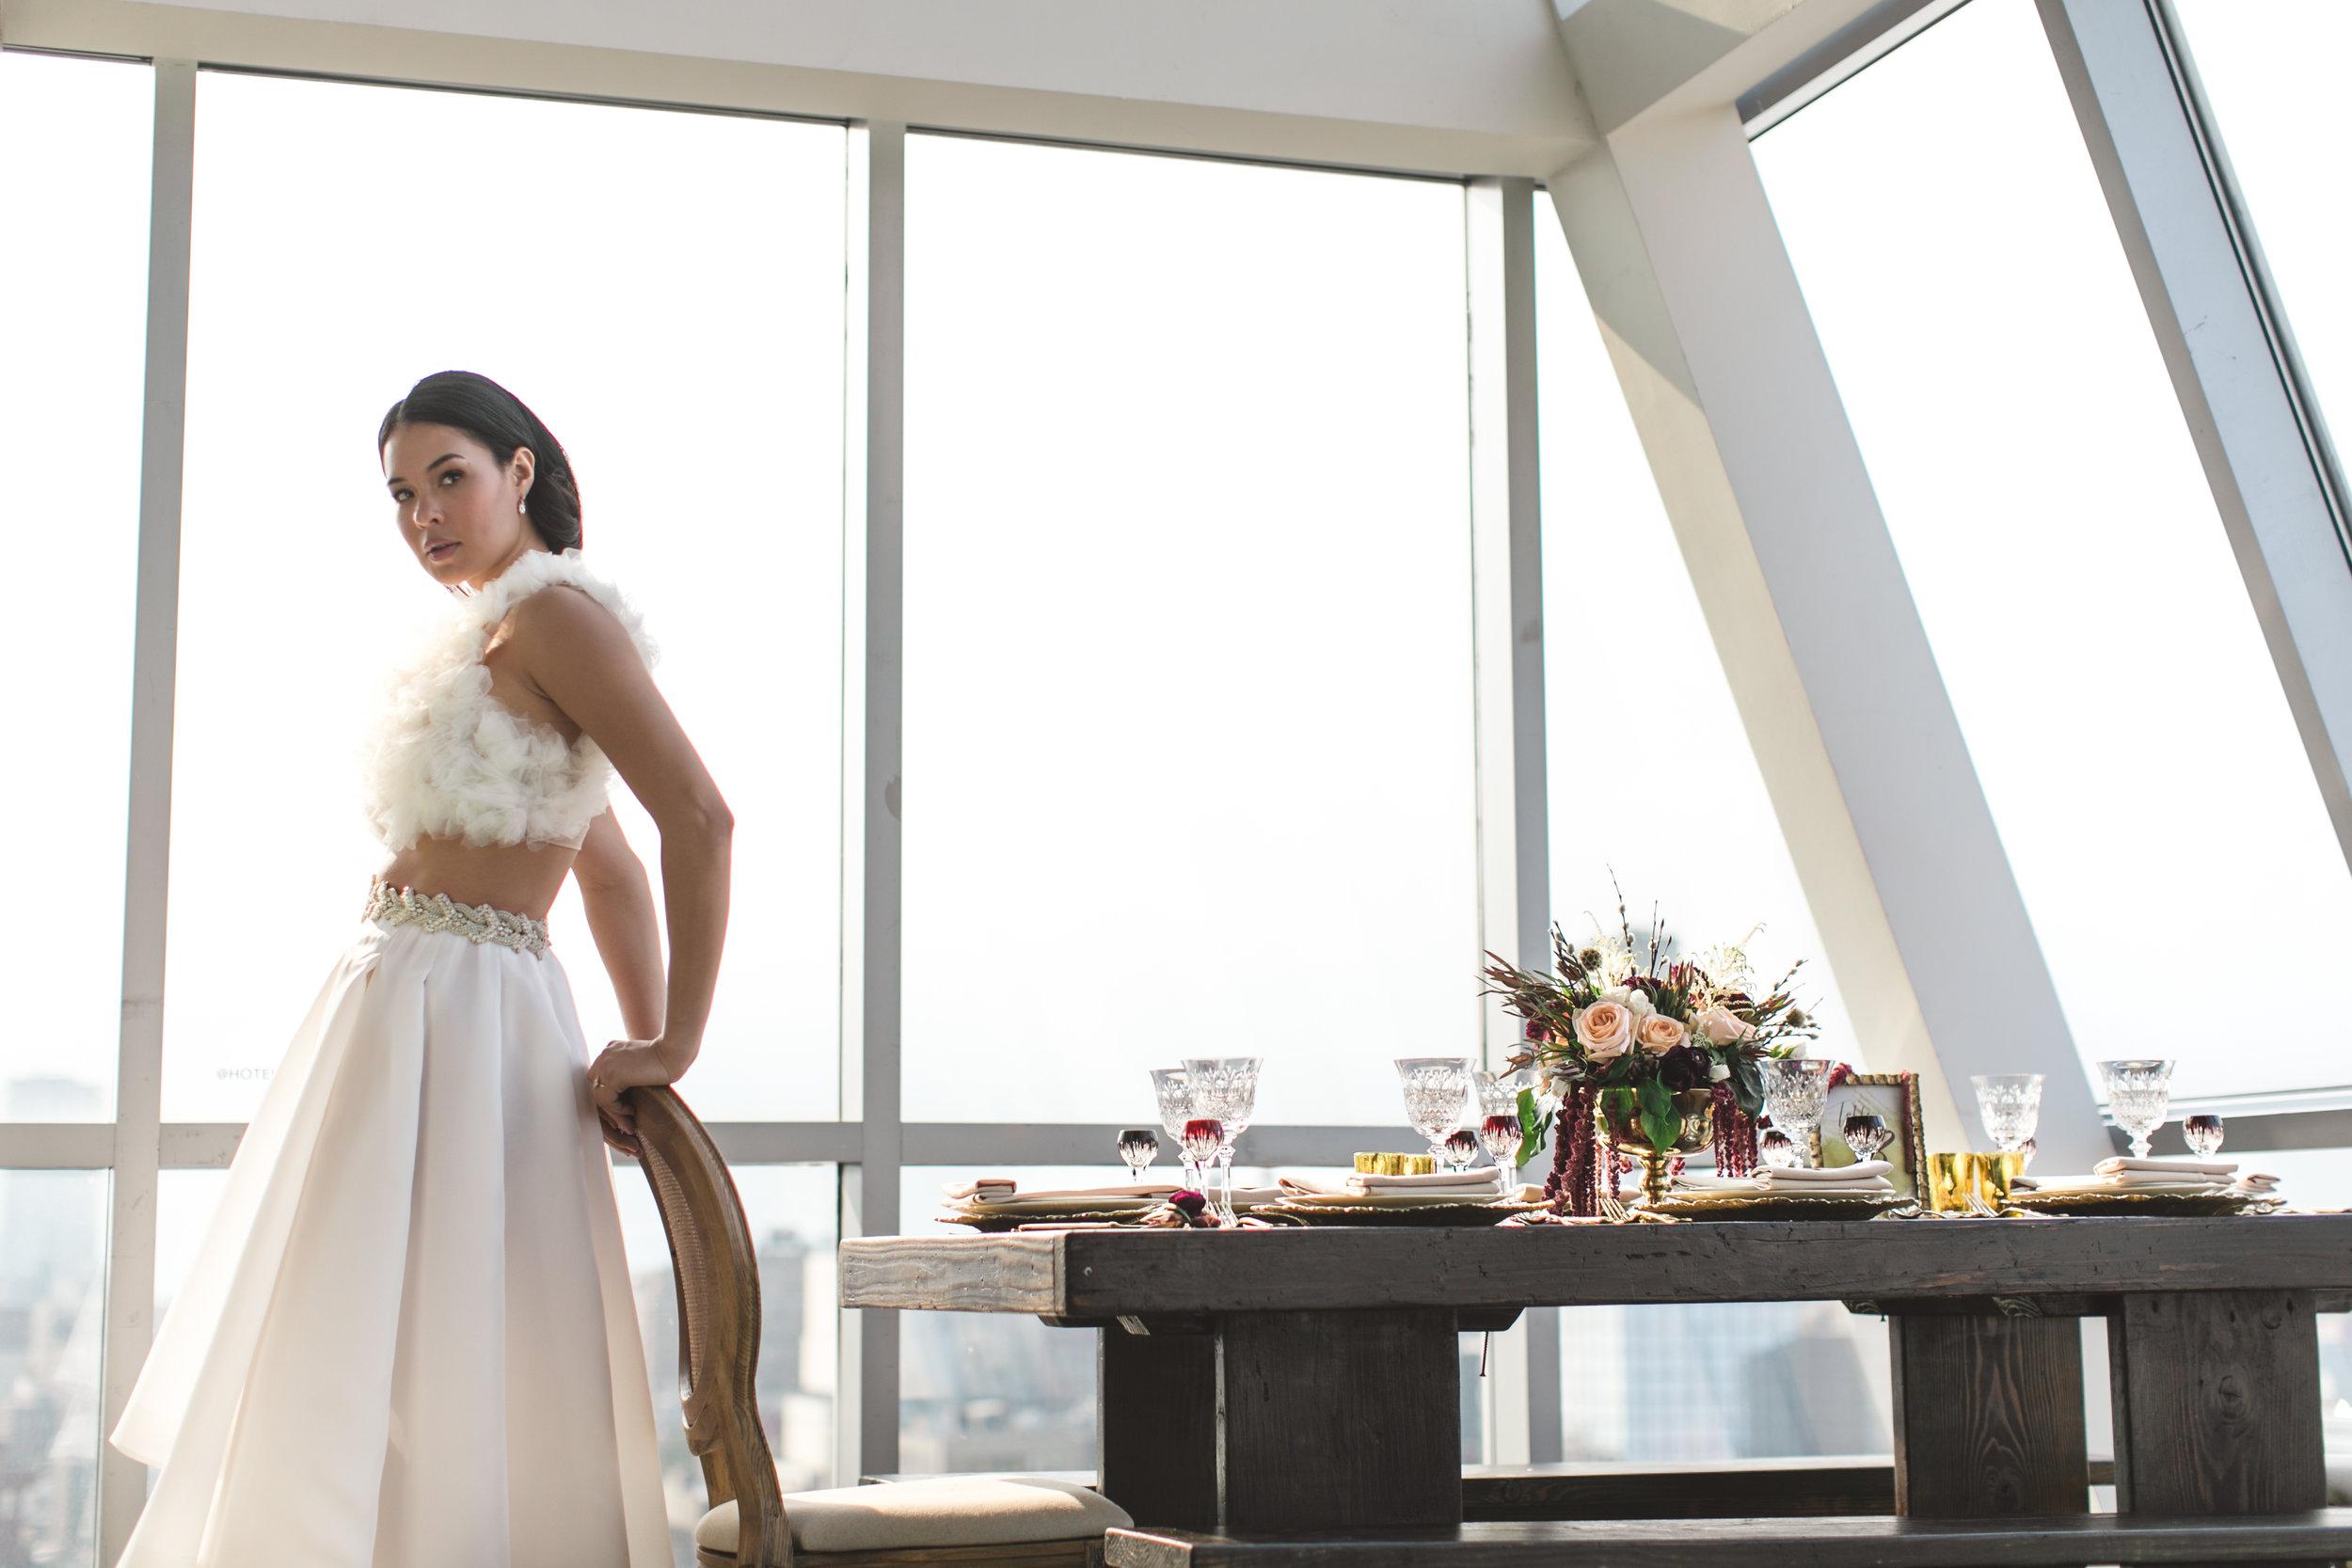 Nathalie Kraynina BrideBond_Girl_Bride_GinaEsposito-74.jpg